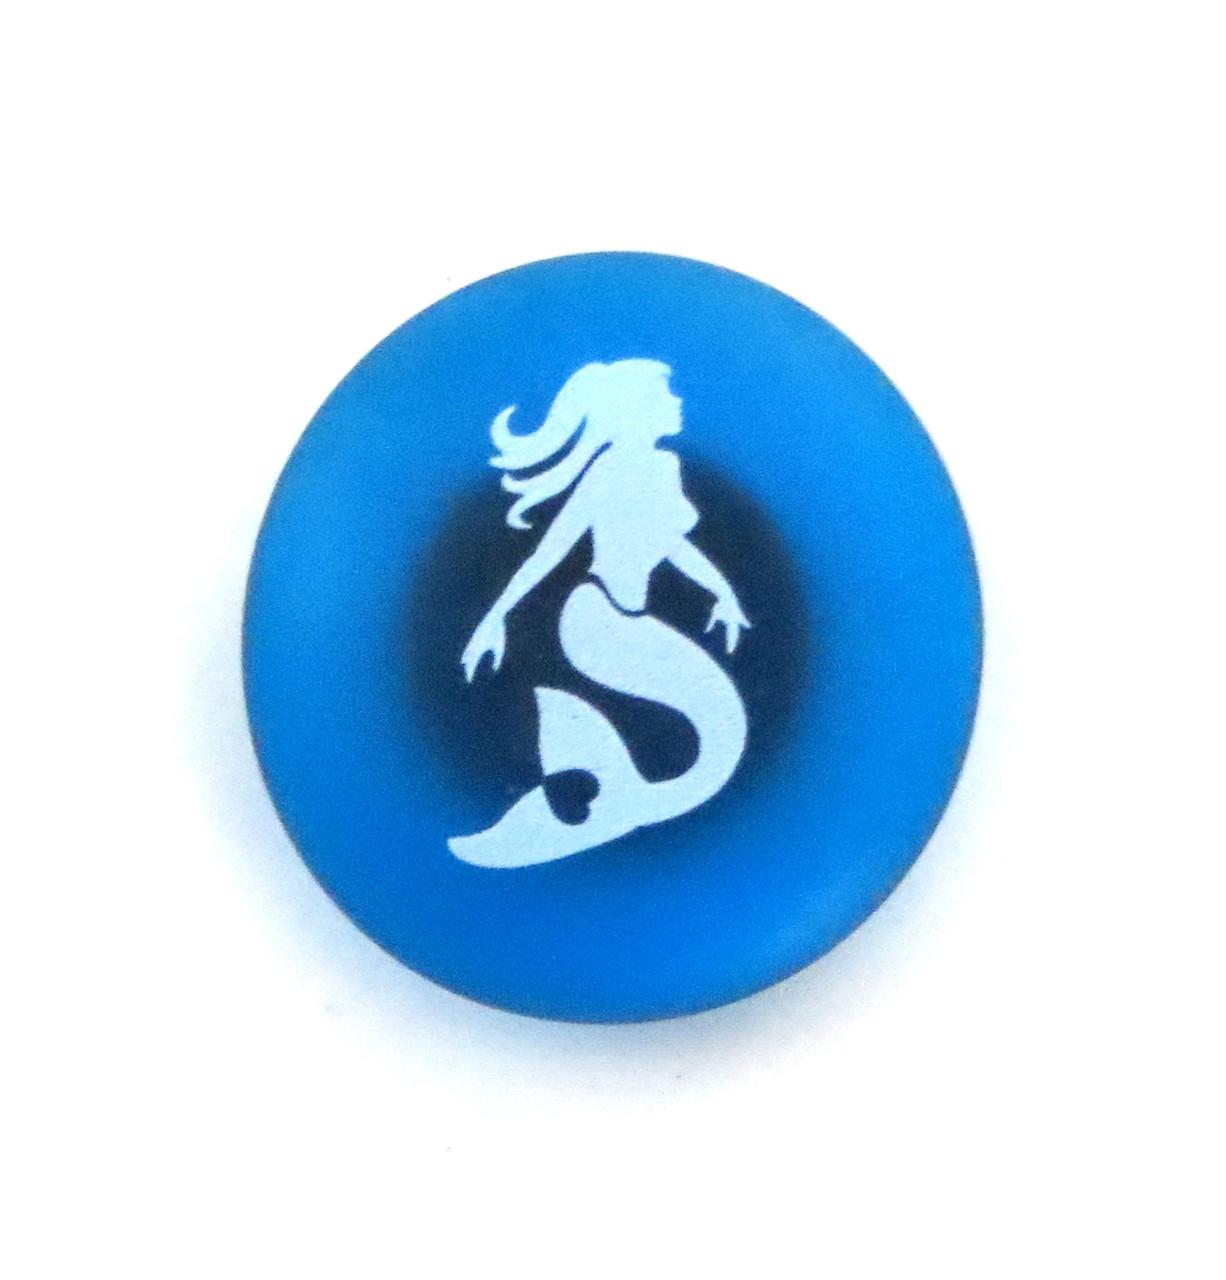 Mermaid Message